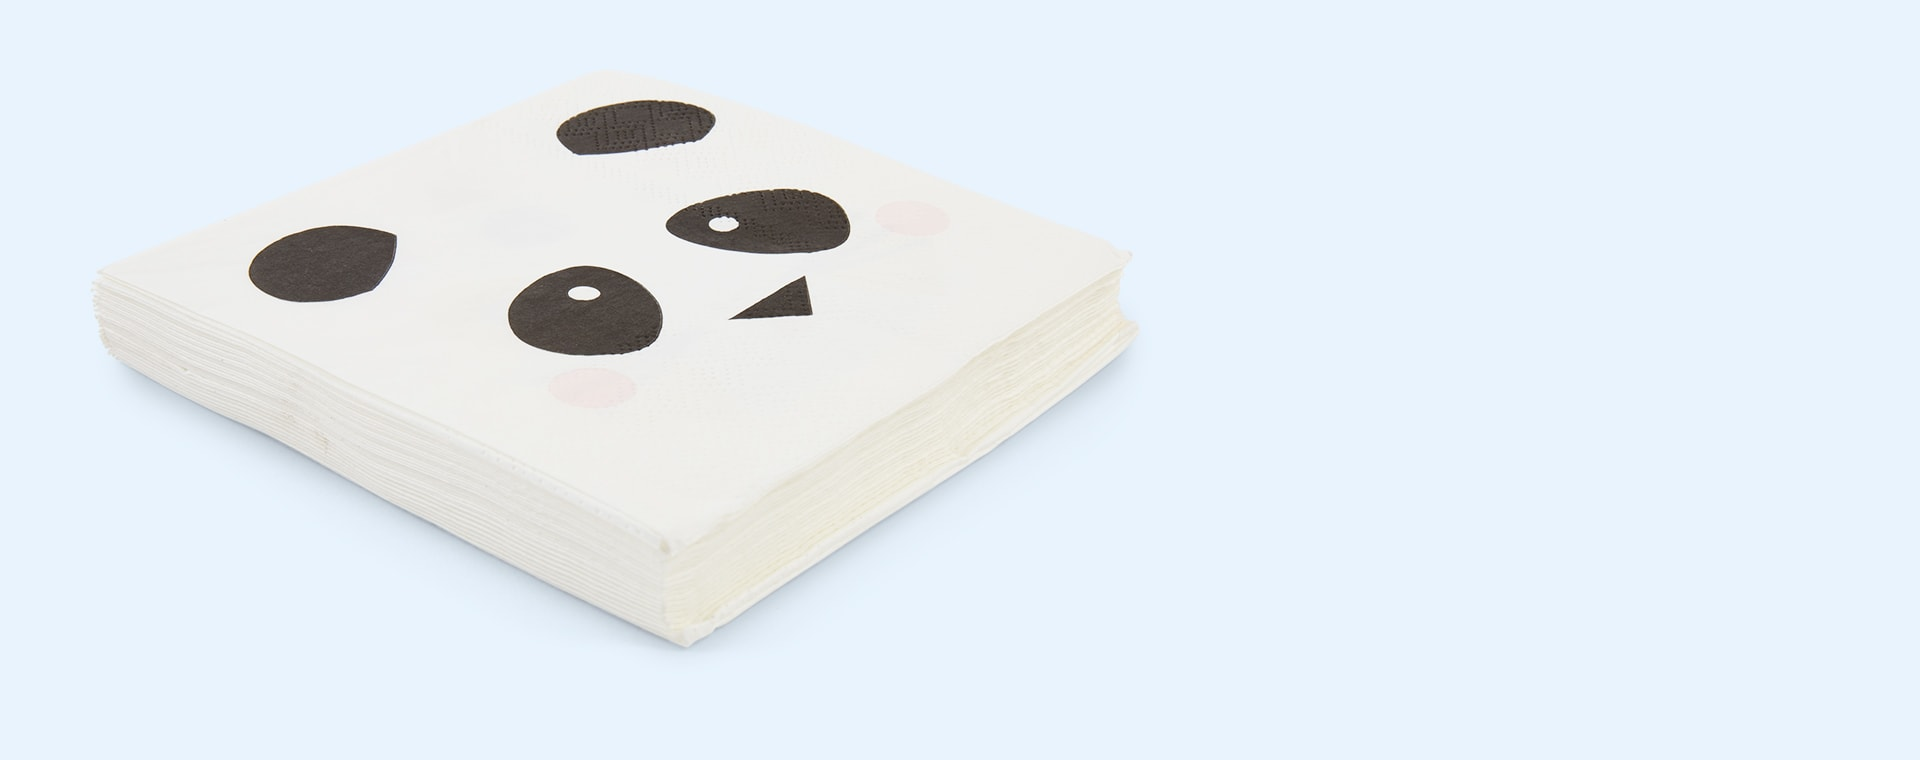 White My Little Day Mini Animals Paper Napkins - 20 Pack